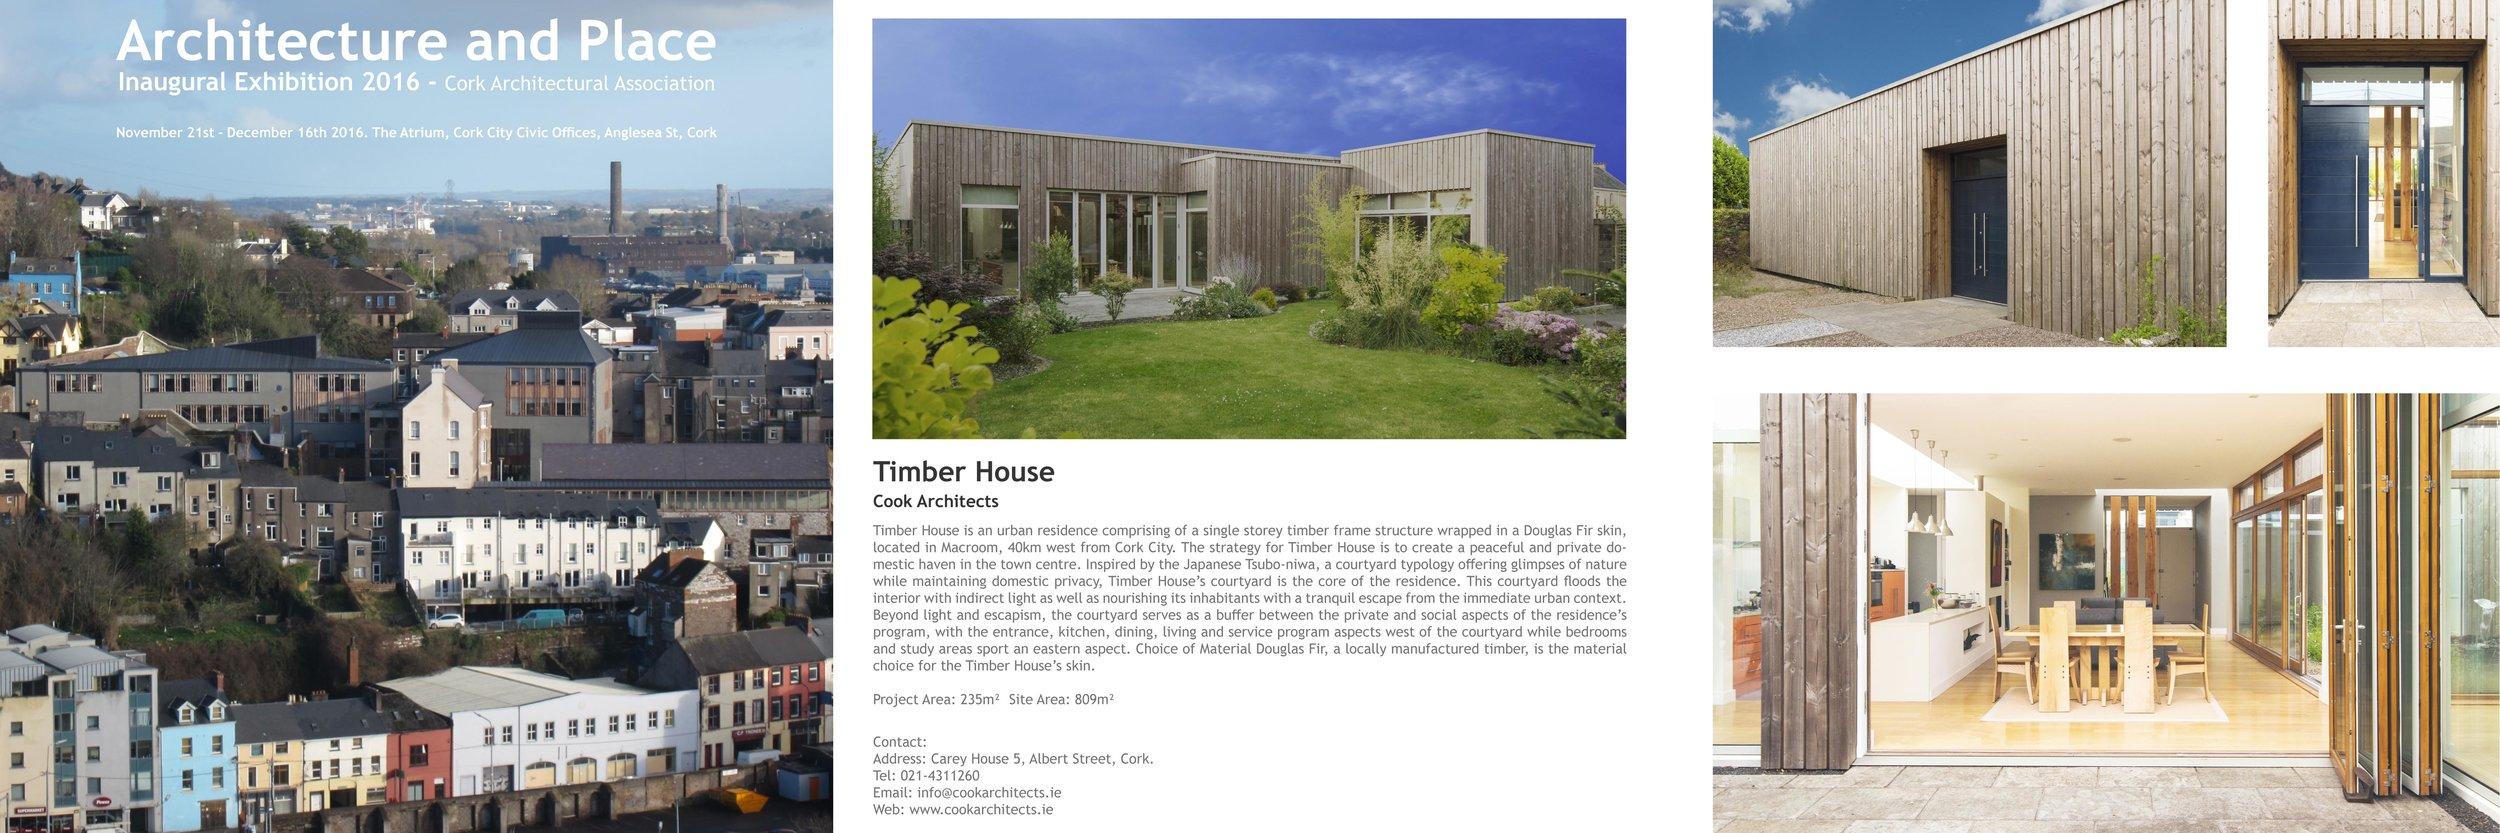 Architecture and Place 2016 - Architecture Exhibition - Cork Architectural Association